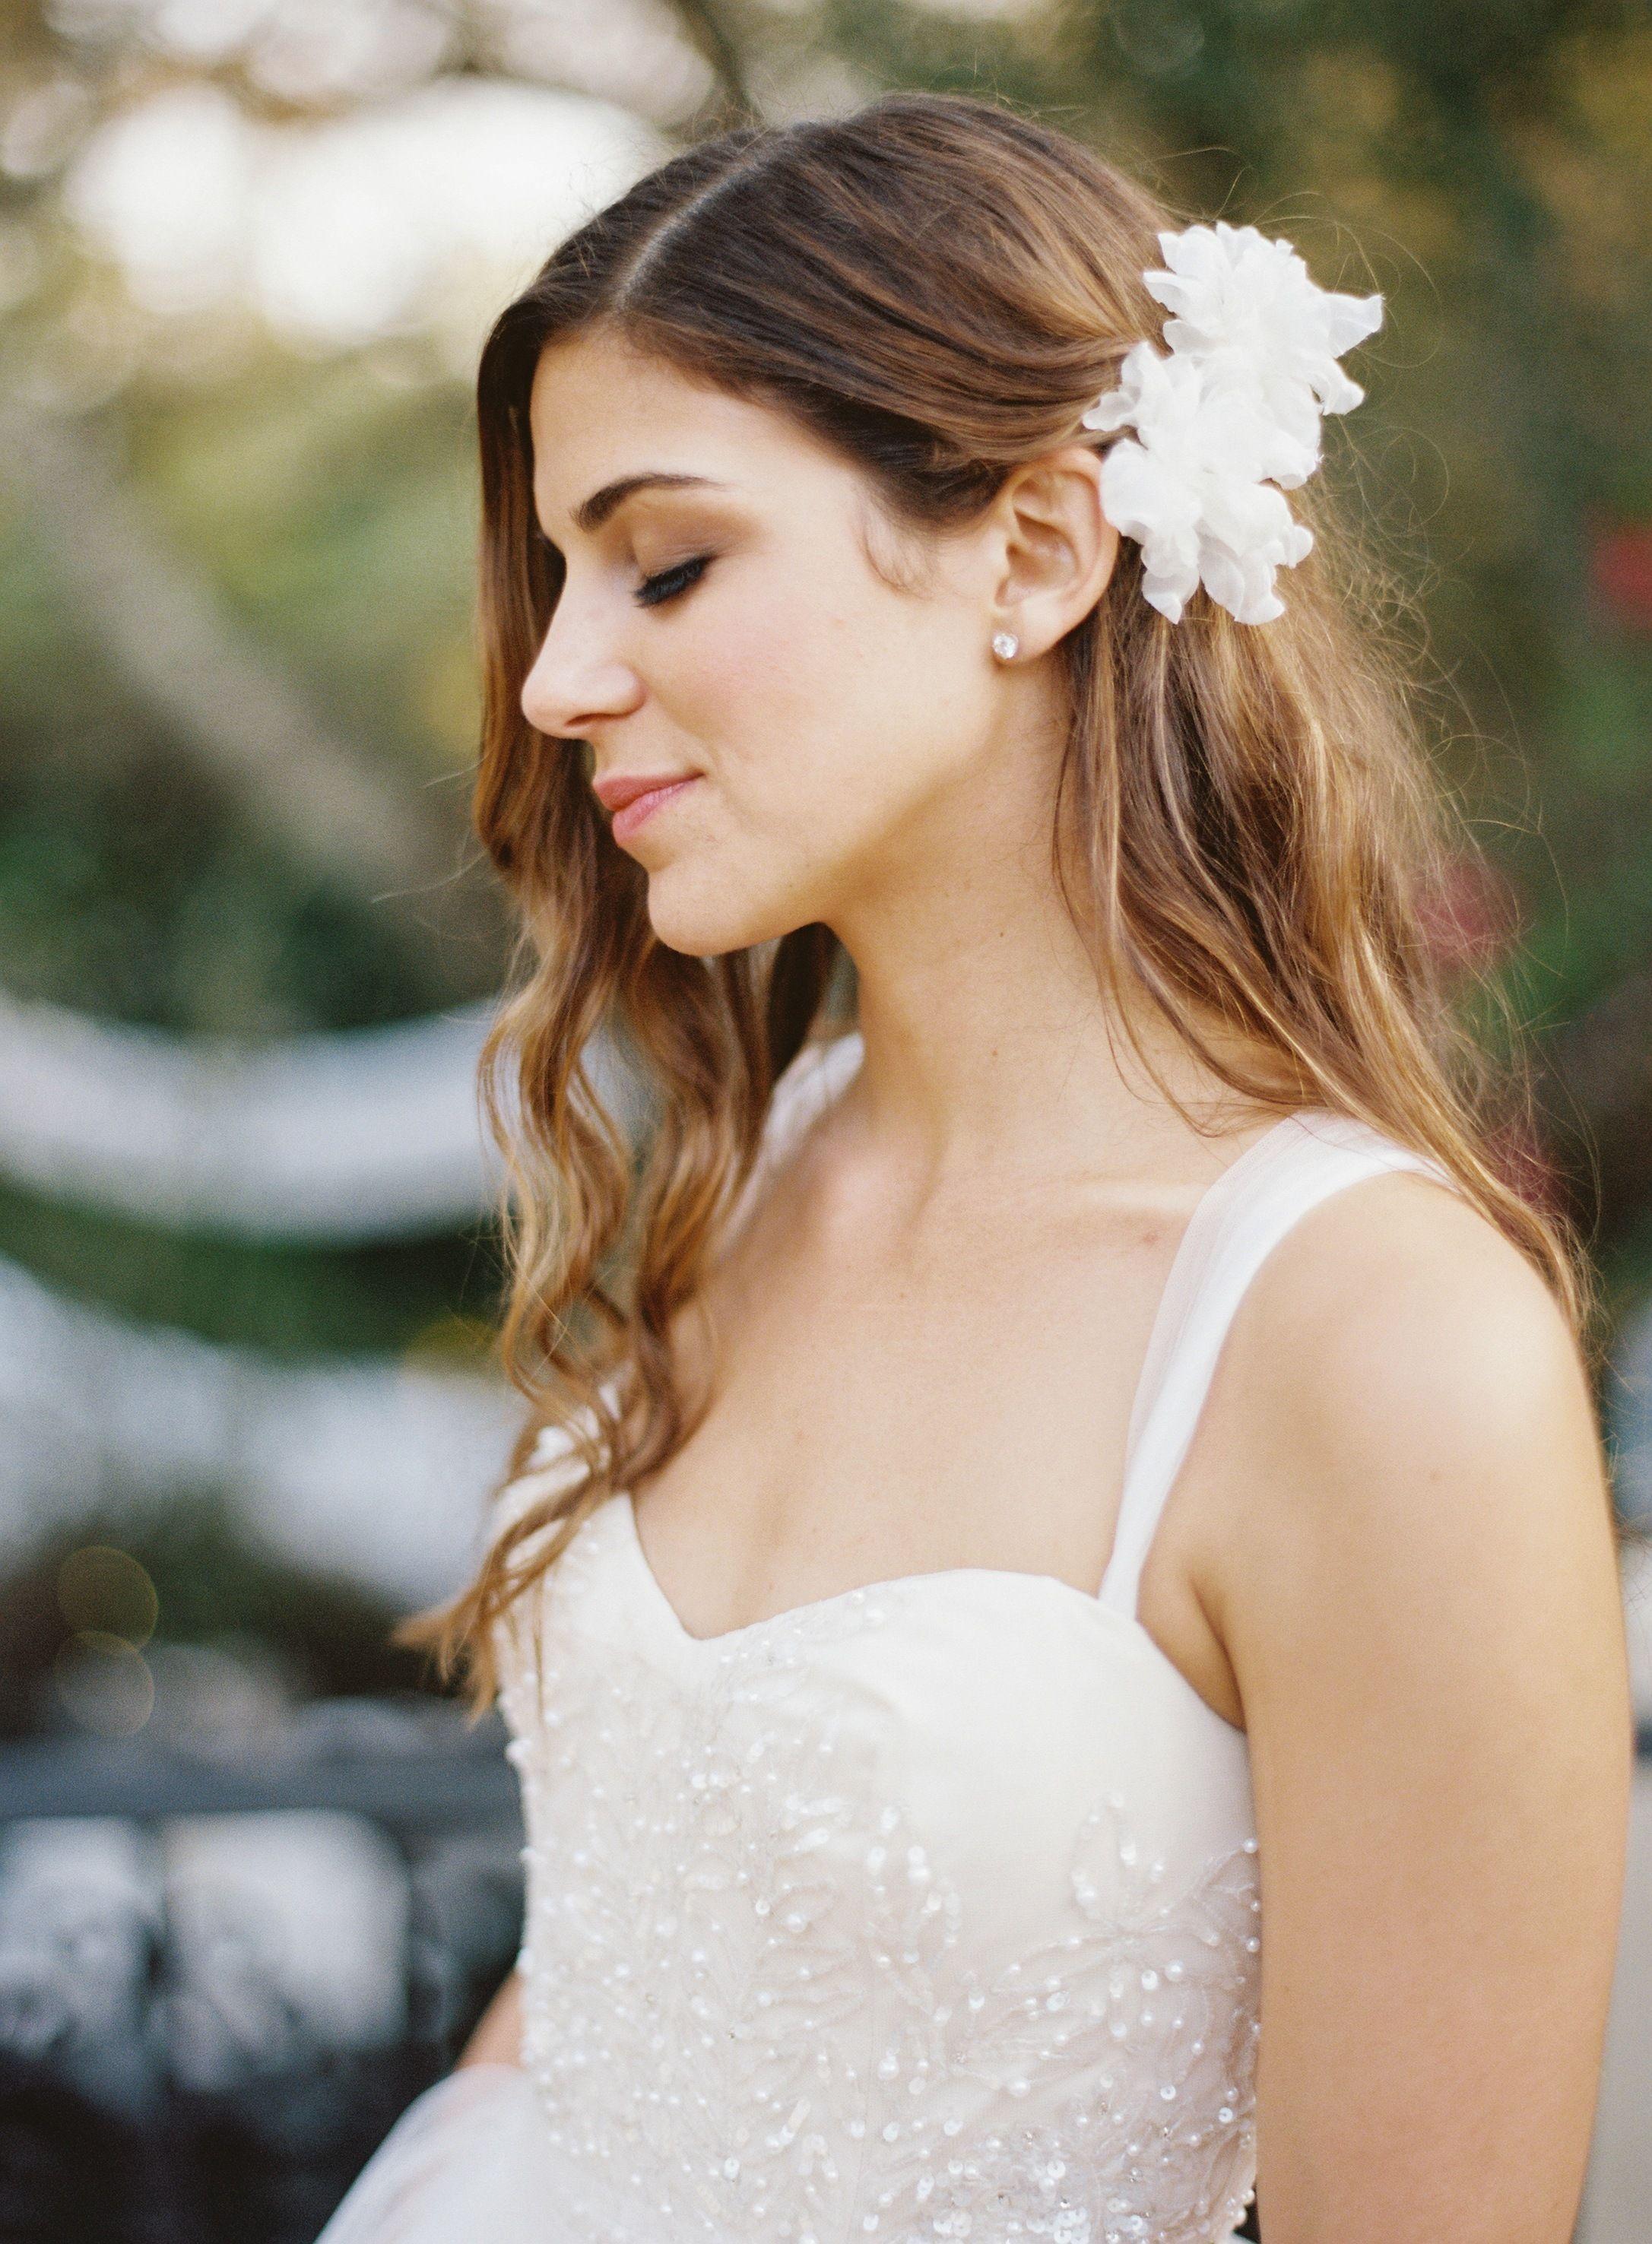 miami wedding from ozzy garcia photography | bridal